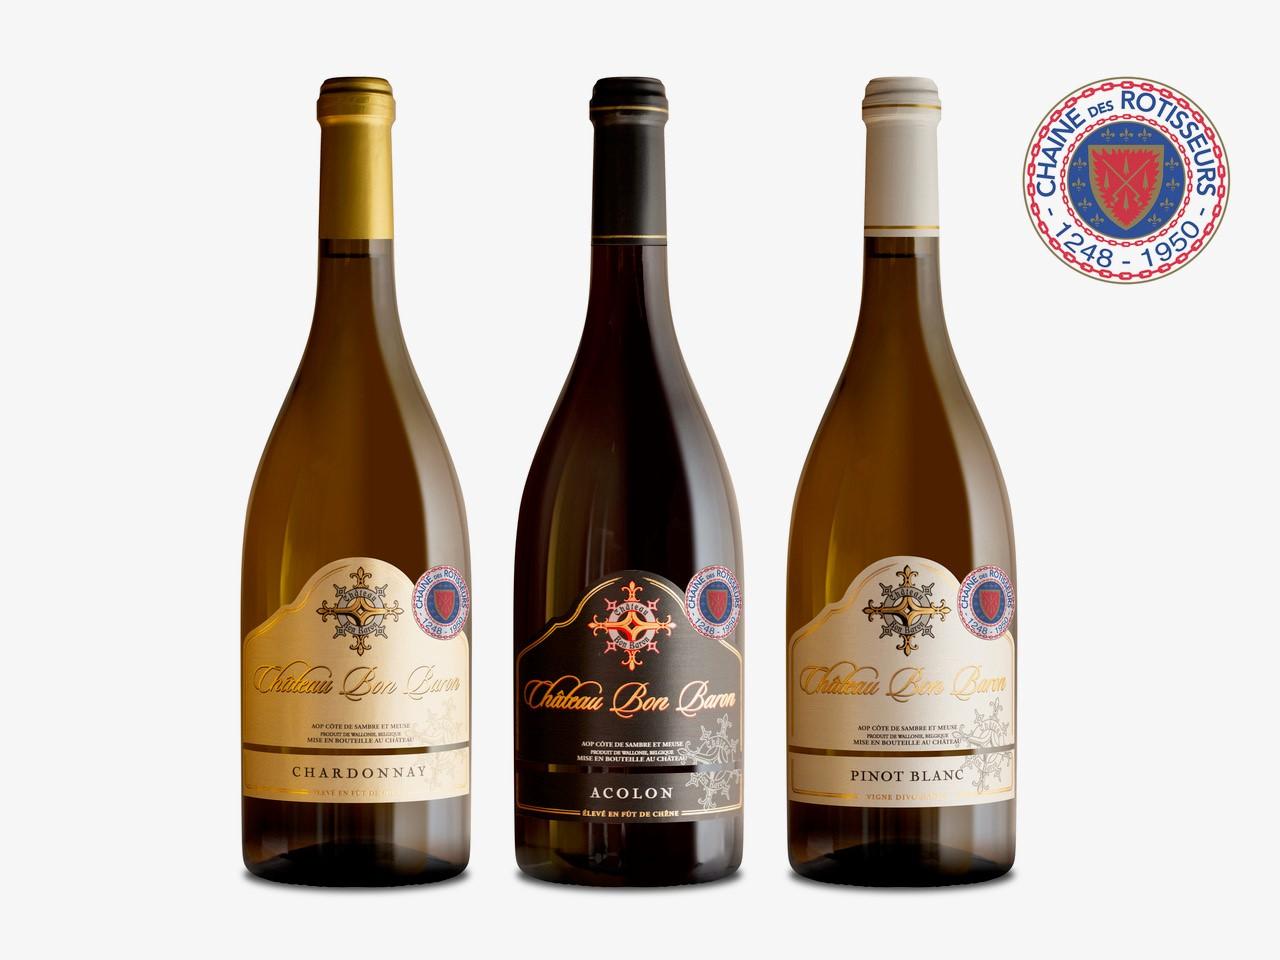 Chaîne des Rotisseurs (3) Wijnpakket